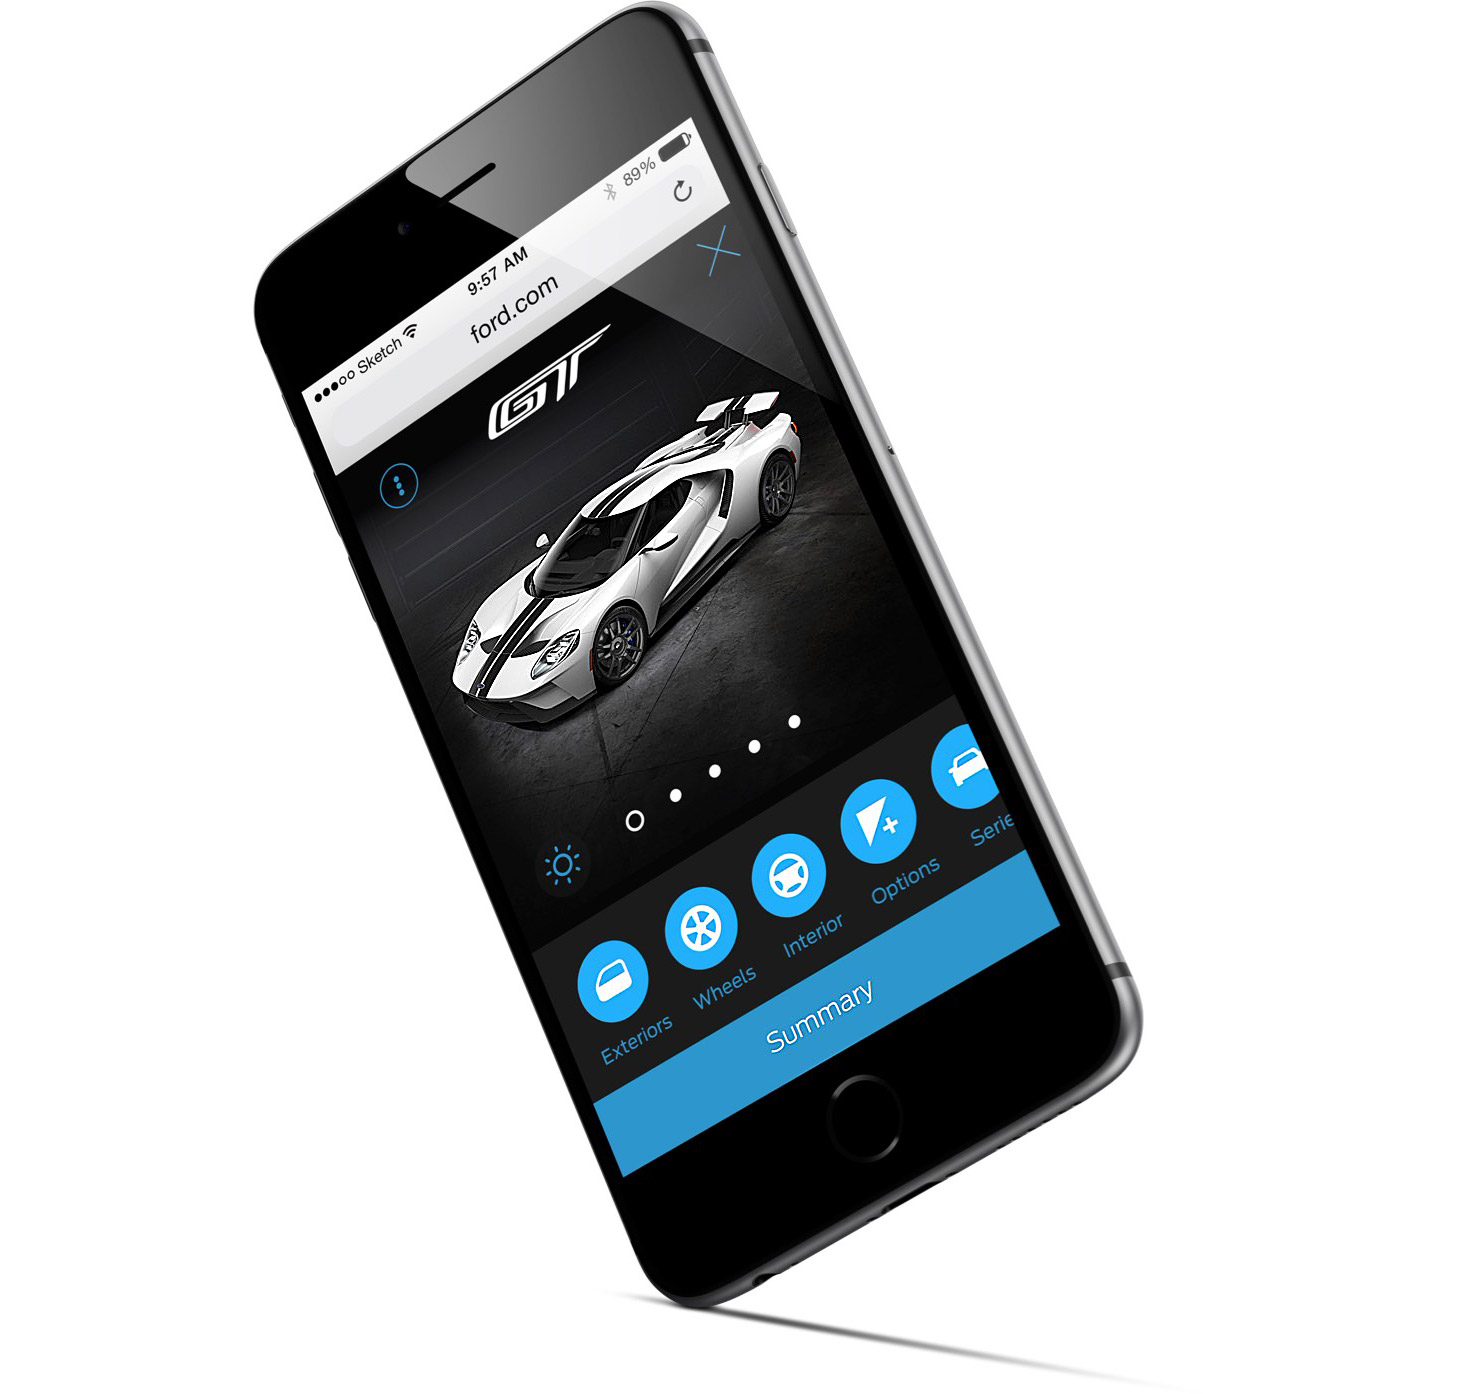 gt-config-phone01-lg-2